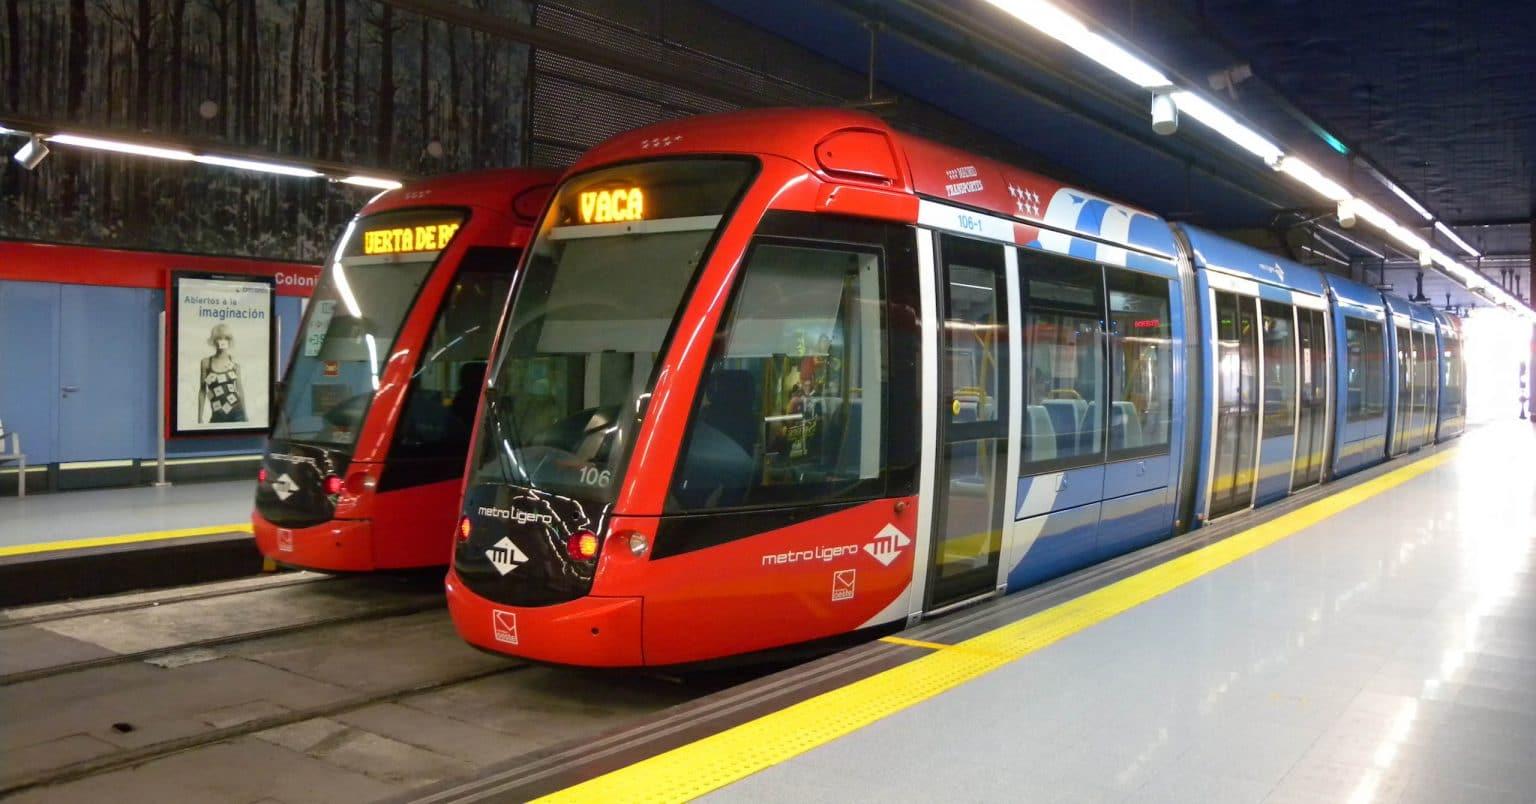 Tranvía Citadis de Alstom en Colonia Jardín, Madrid. Foto: Ricardo Ricote